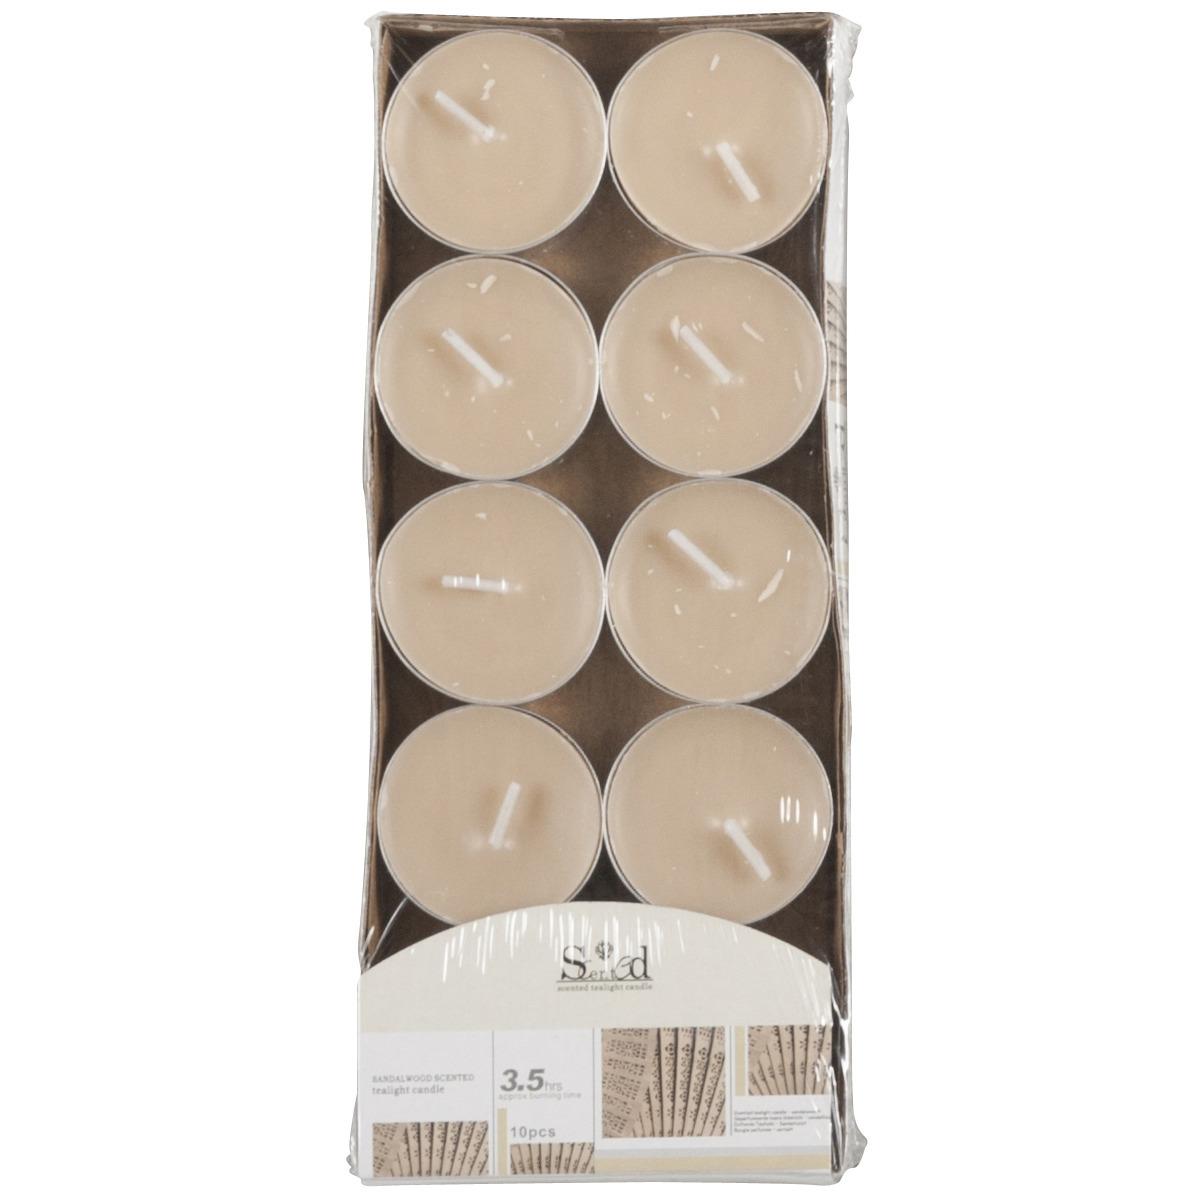 Image of Geur theelichtjes cederhout beige 10 stuks